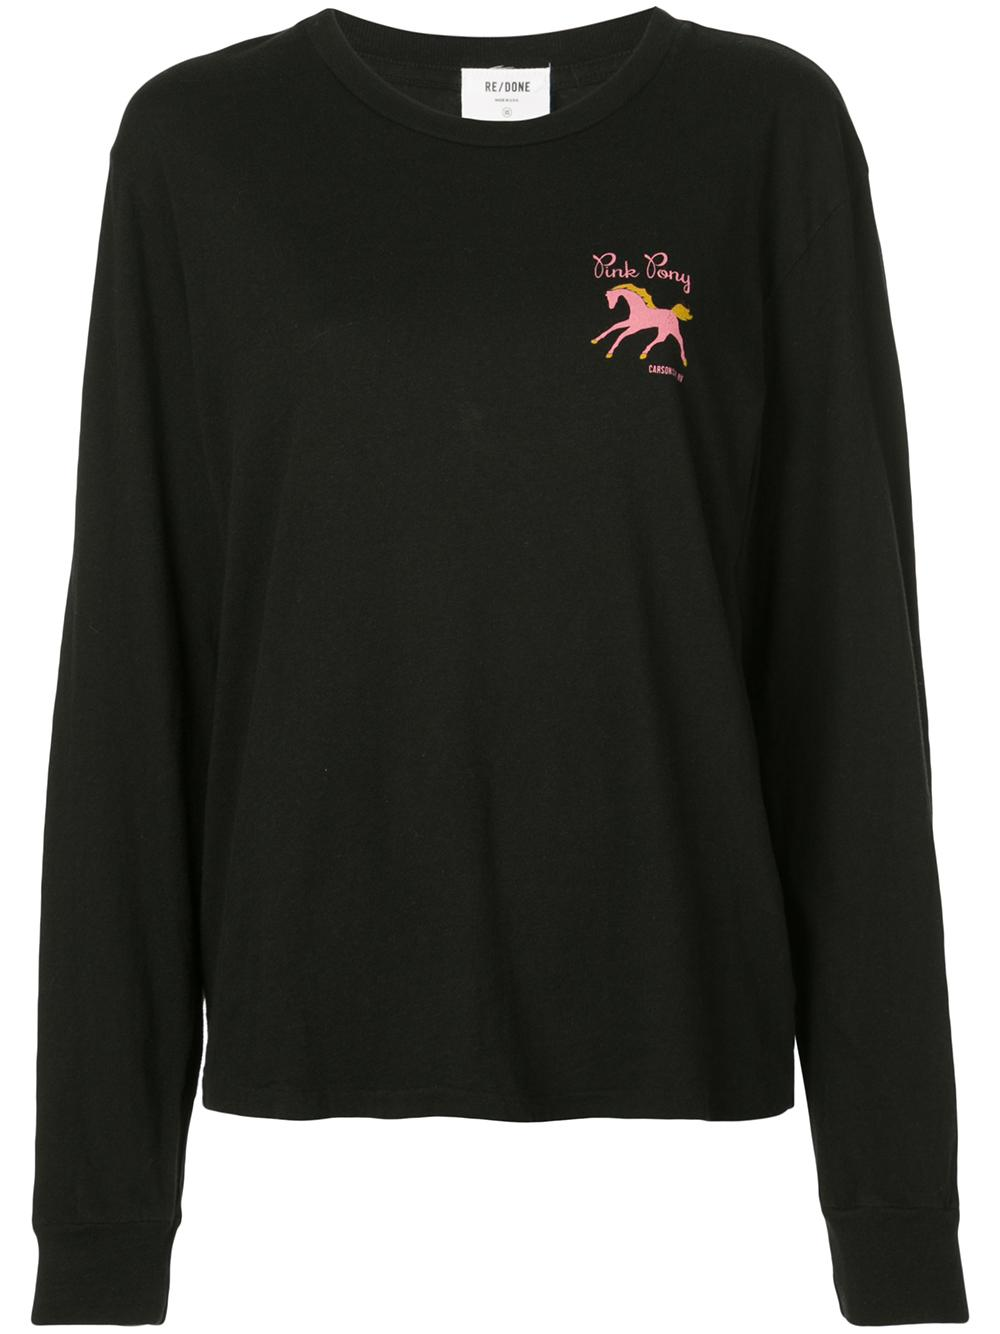 90s Long Sleeve Pink Pony Tee